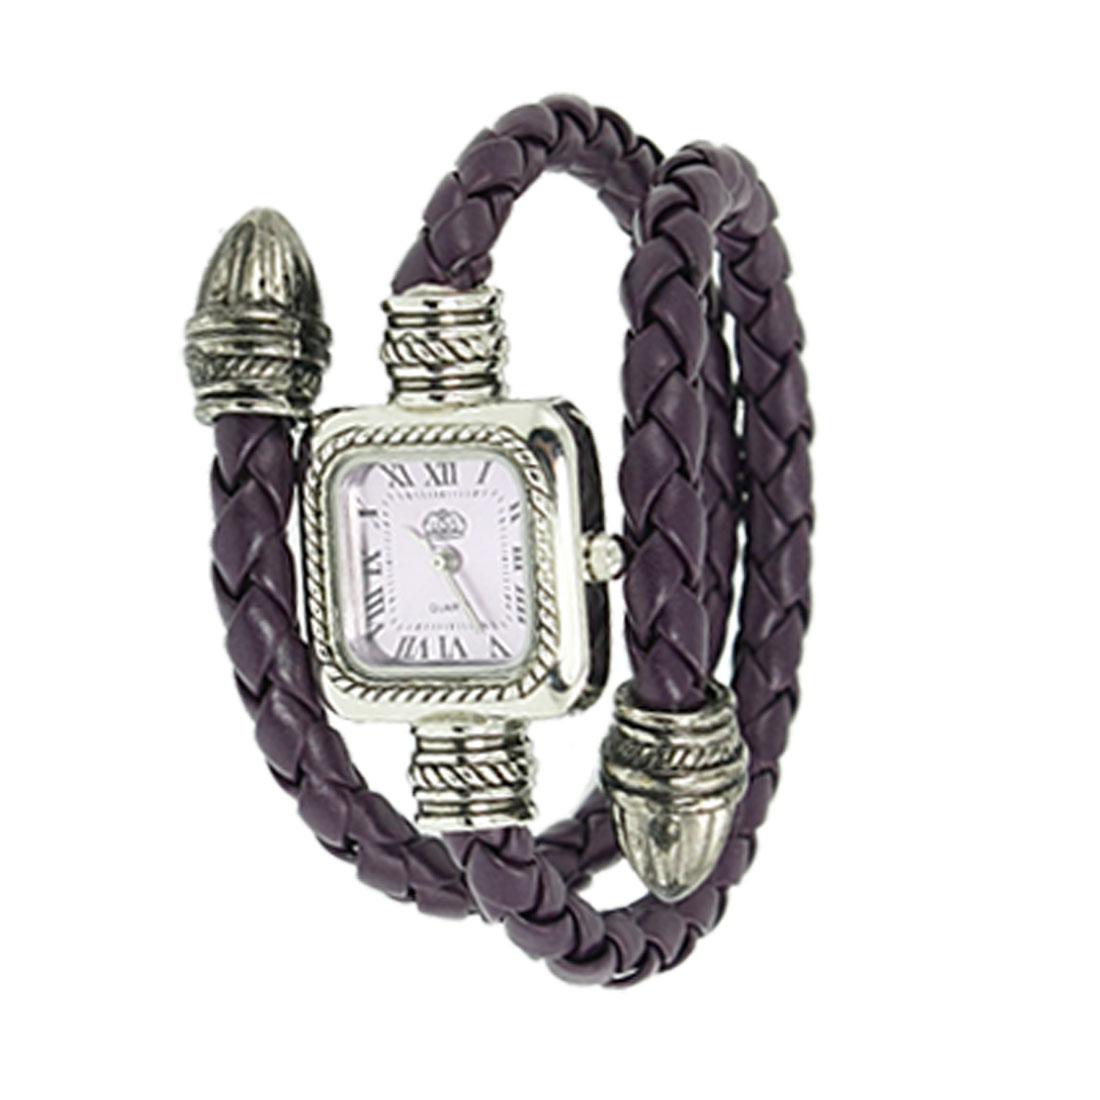 Lady Purple Faux Leather Braid Coated Wristband Bracelet Watch